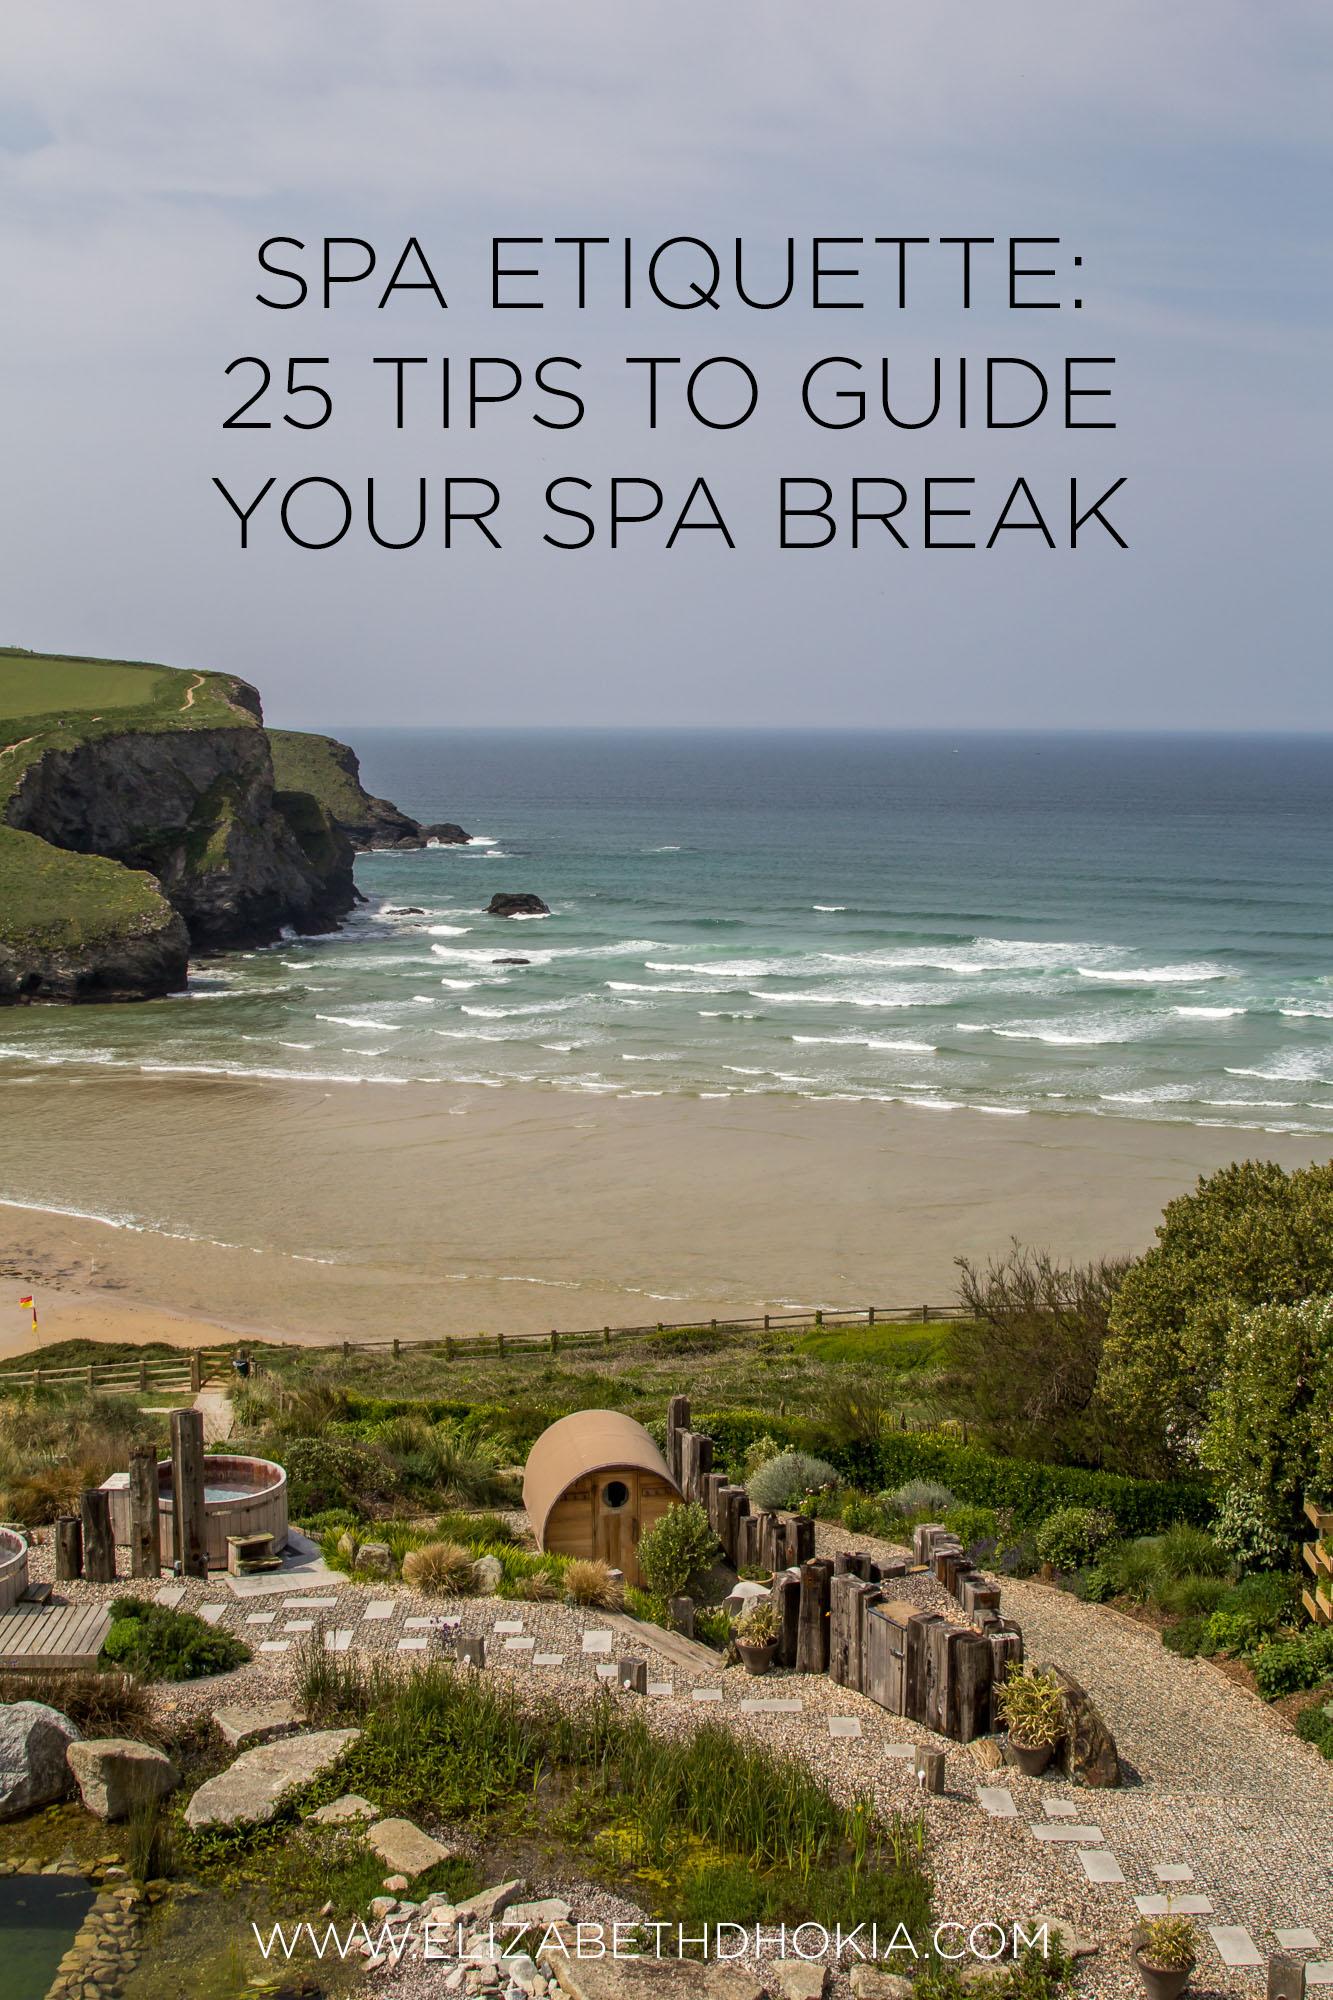 spa etiquette guide